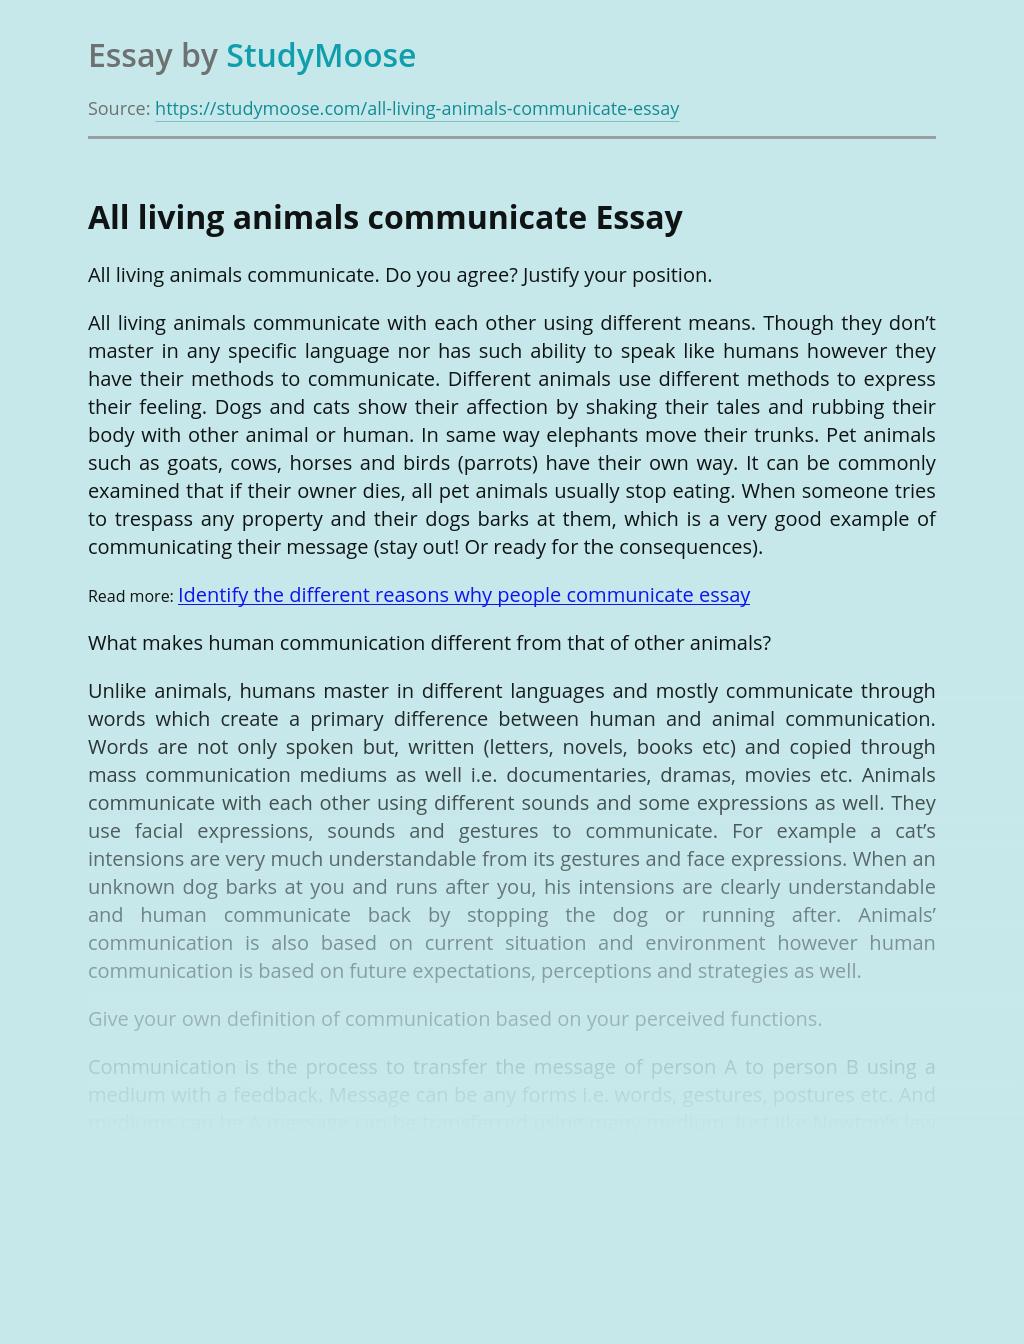 All living animals communicate